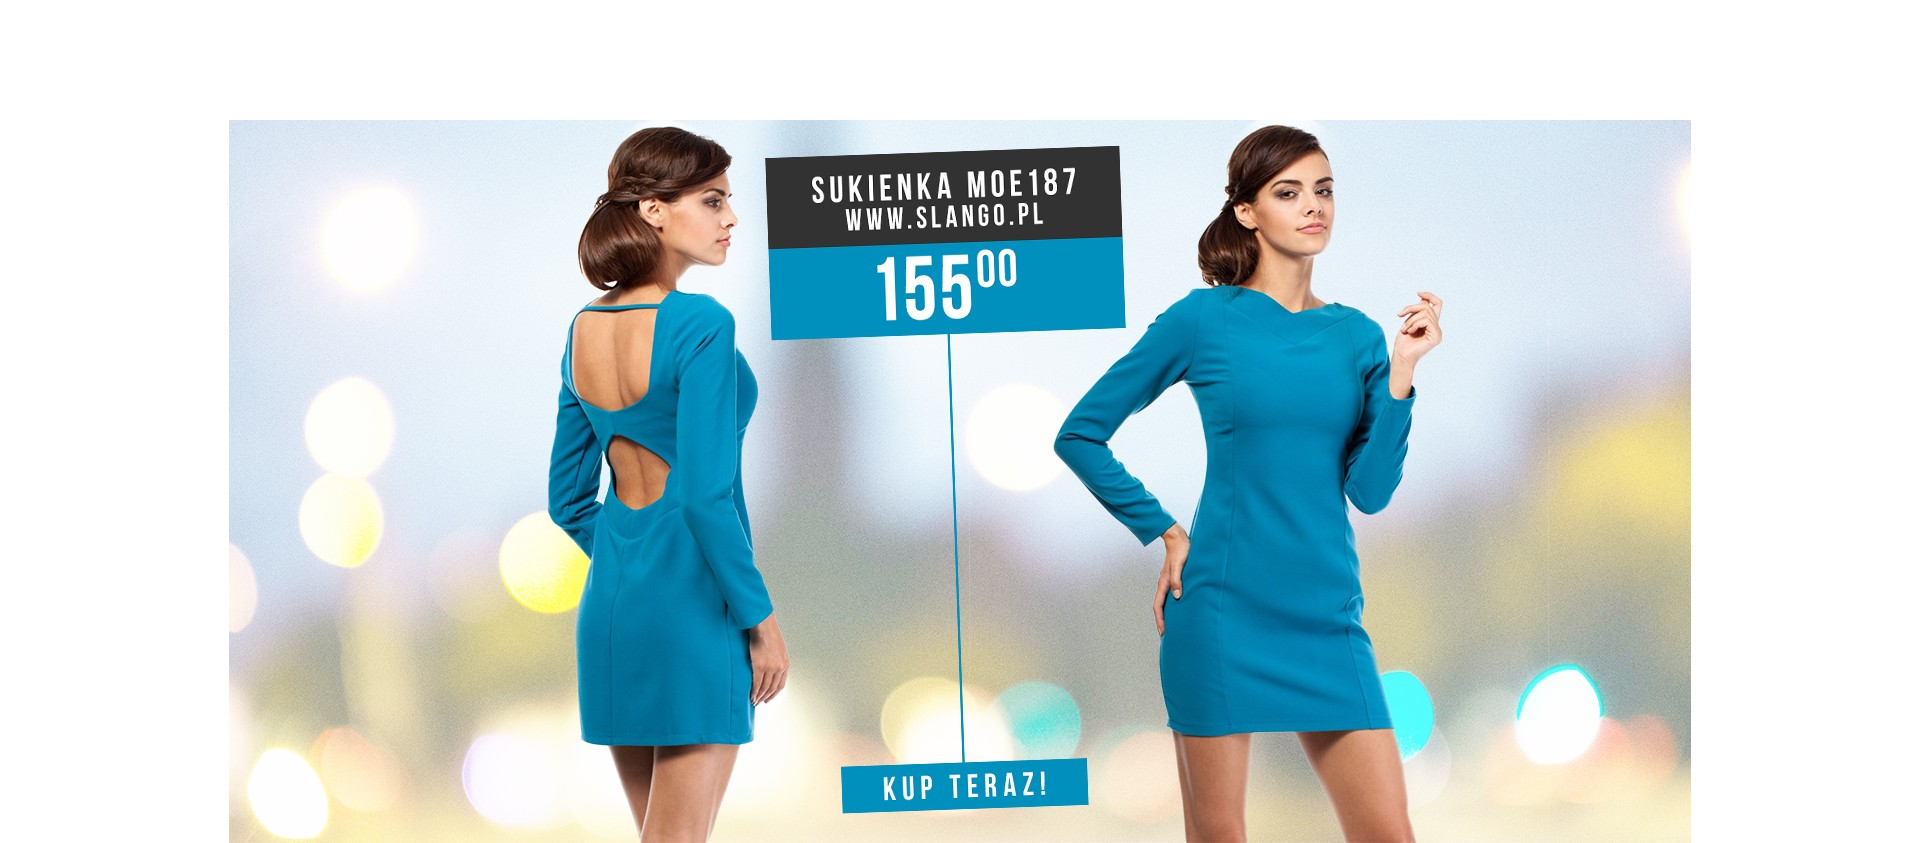 Efektowna sukienka MOE187 Cztery kolory